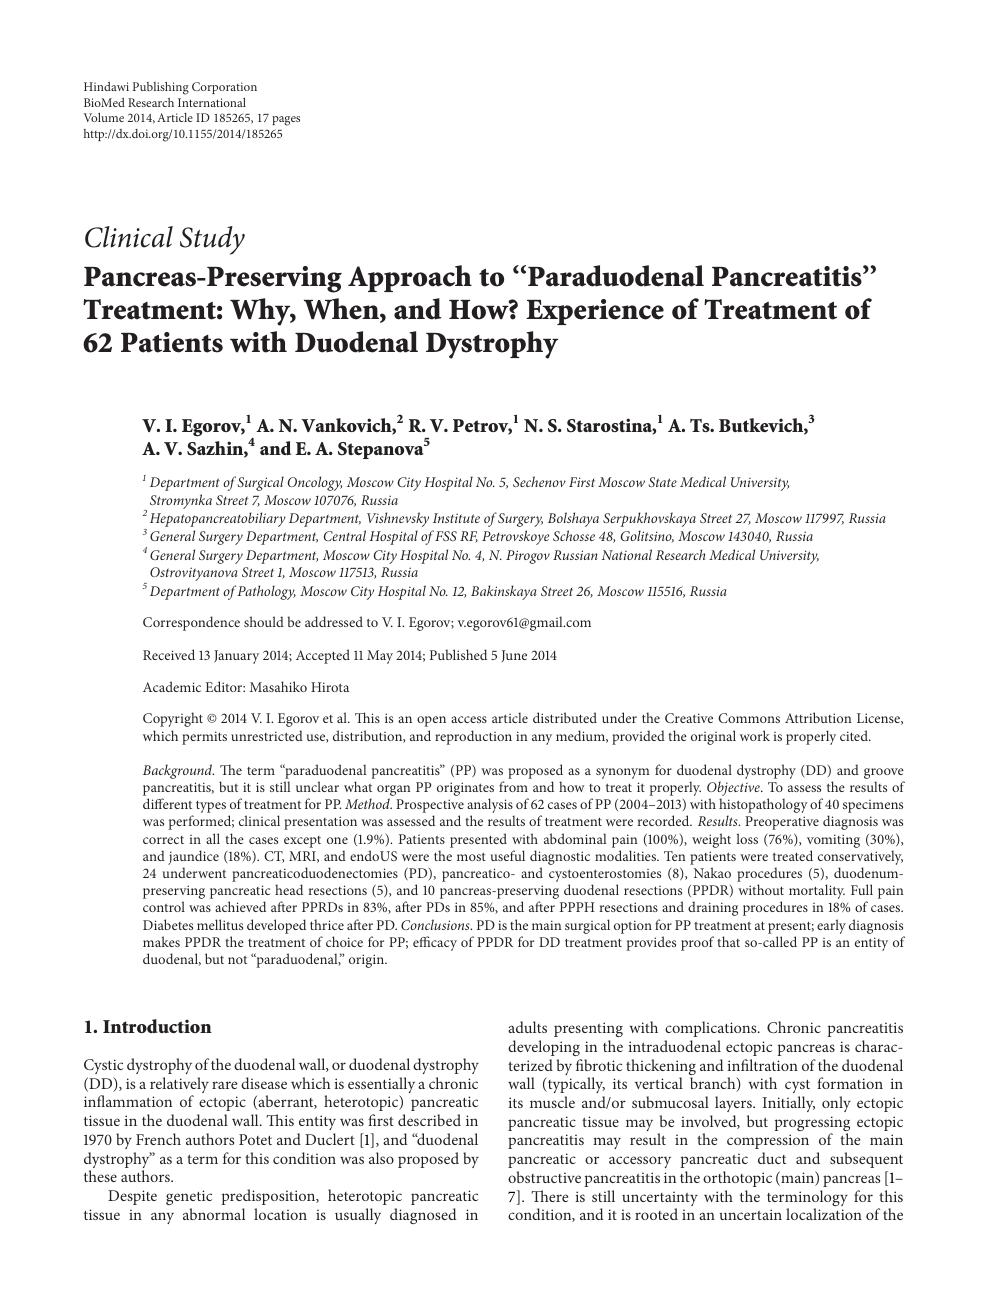 "Pancreas-Preserving Approach to ""Paraduodenal Pancreatitis"